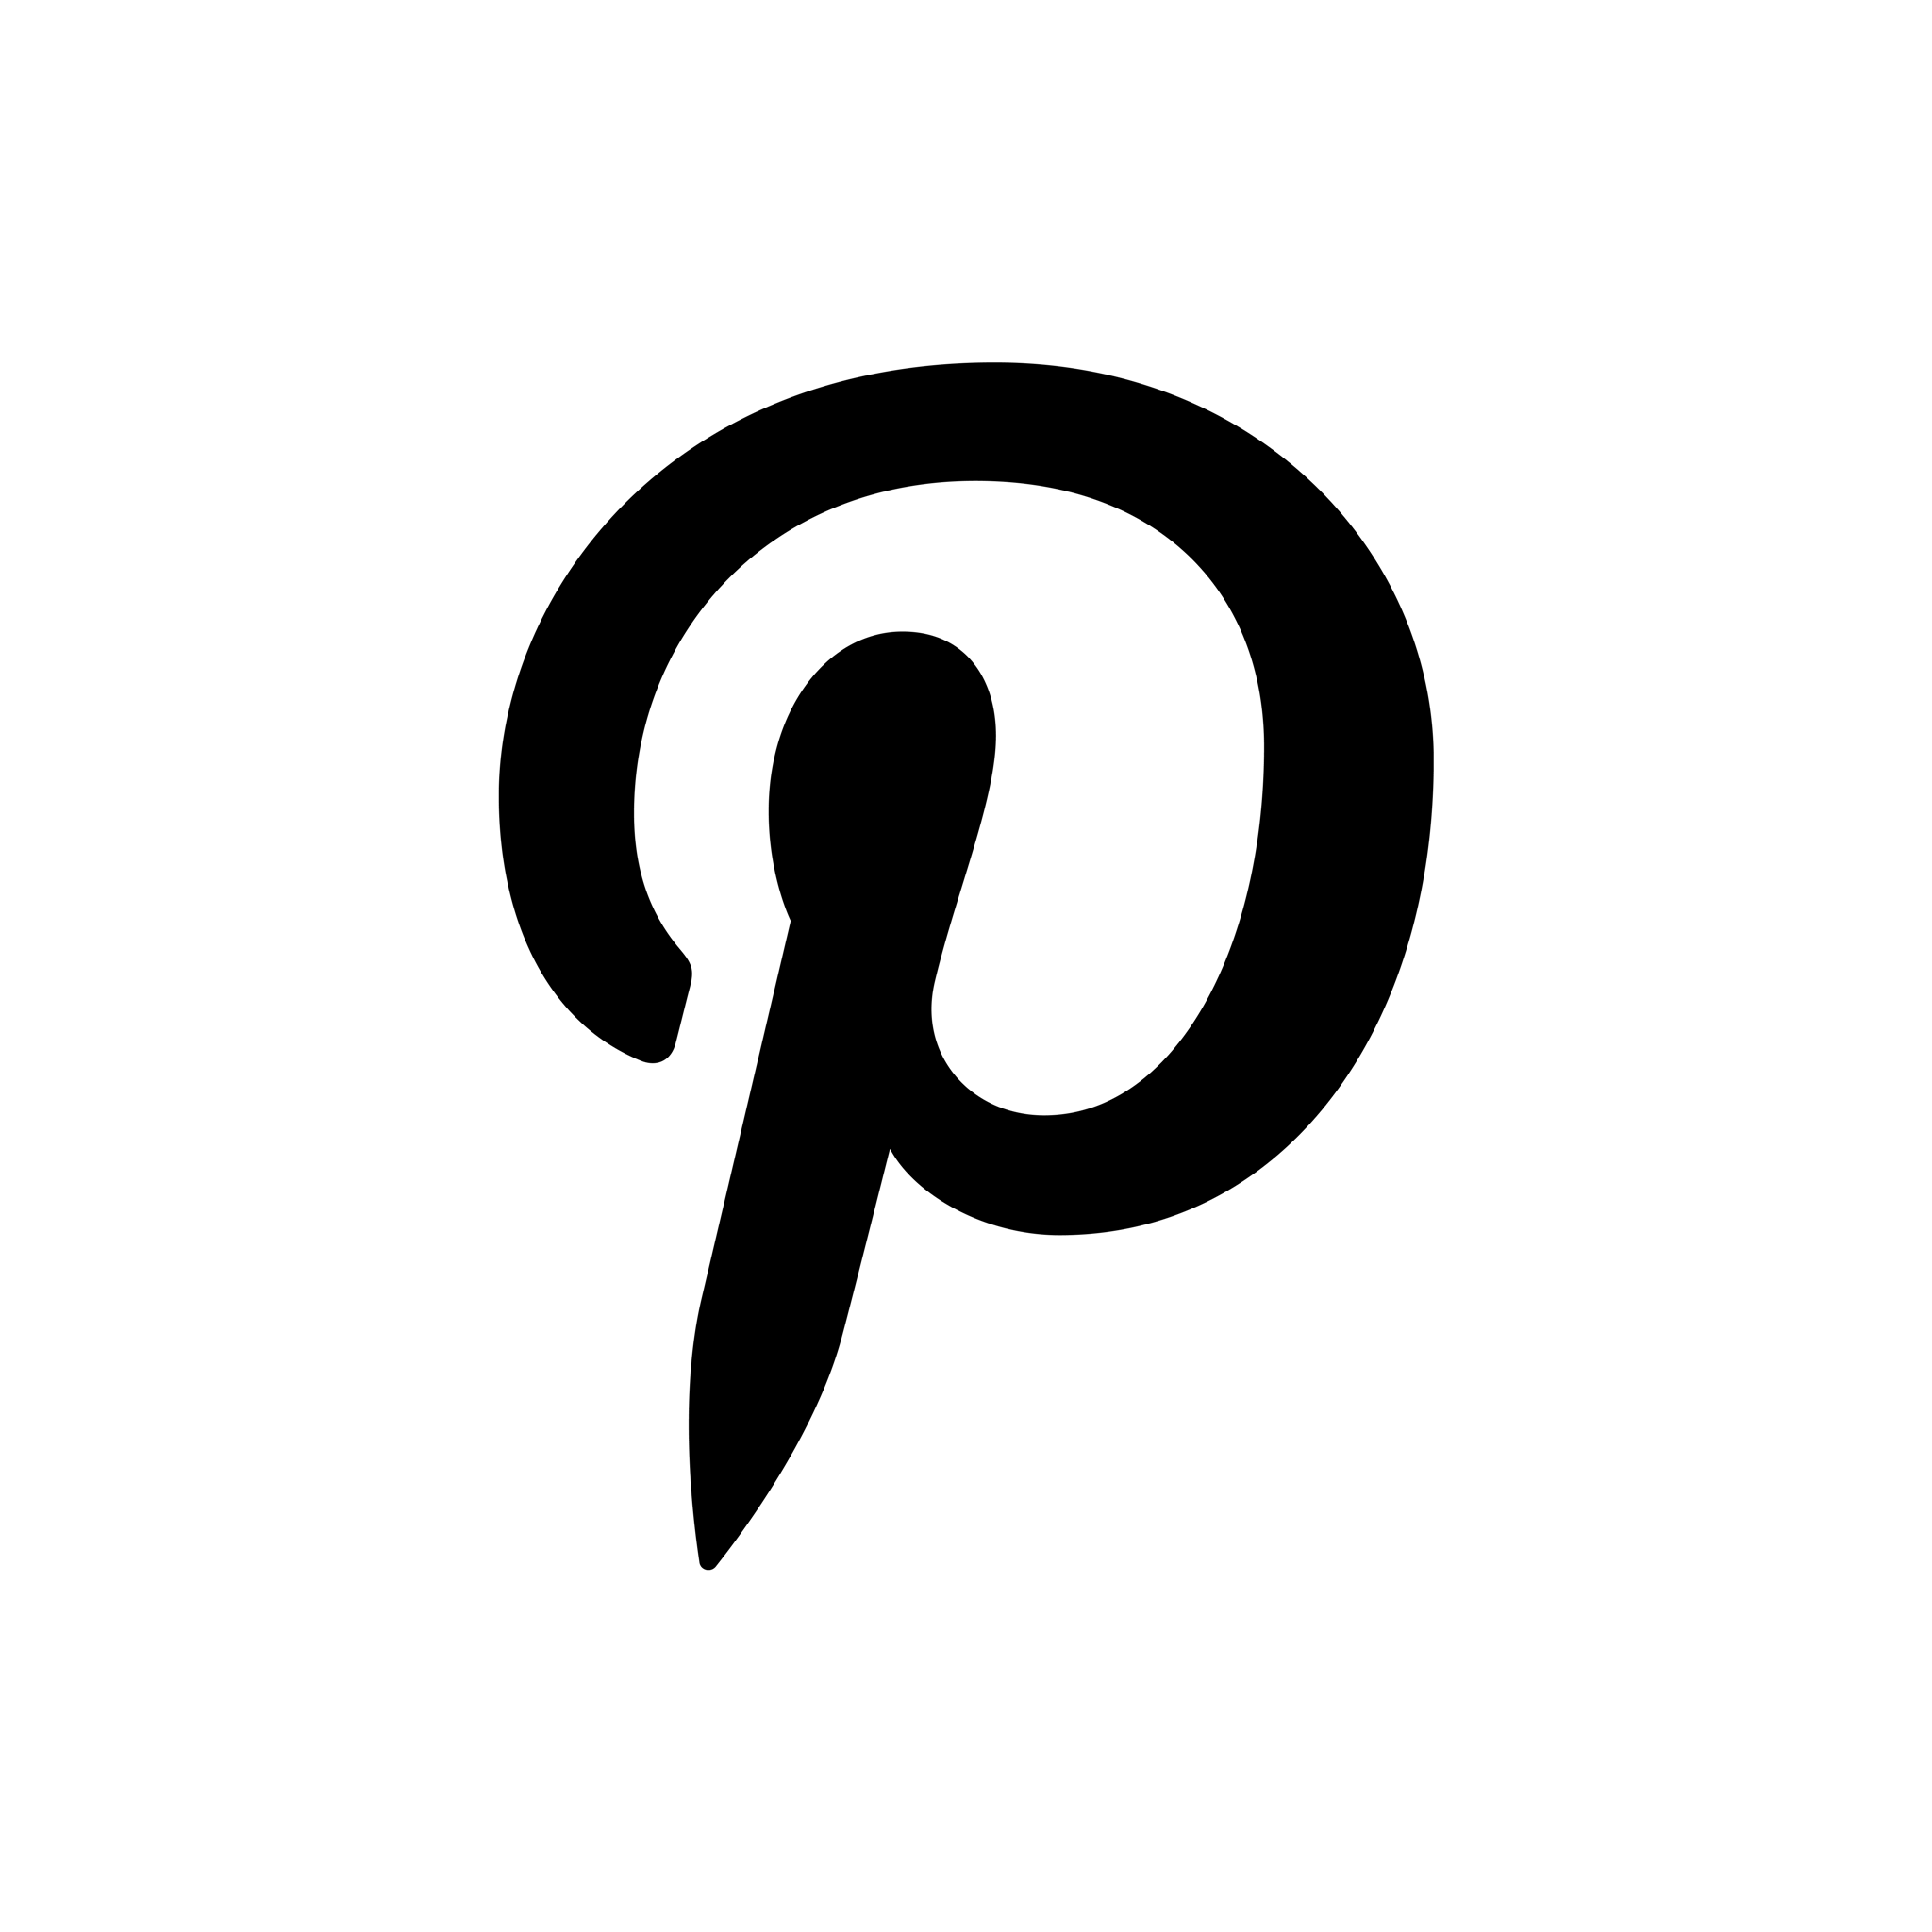 2048x2048 Logo Icons